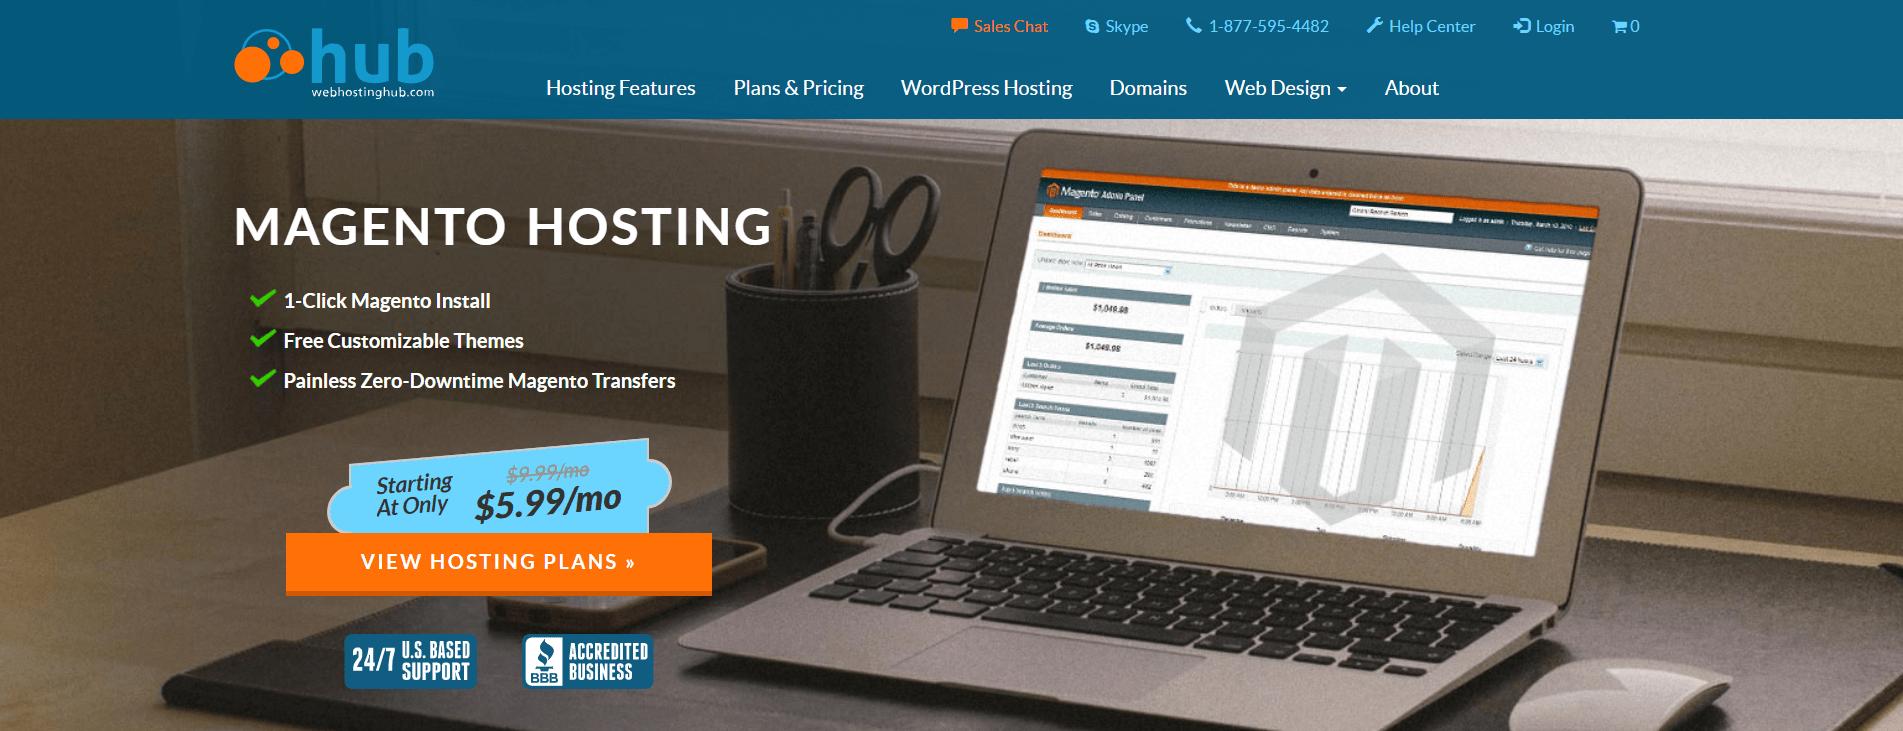 WebHostingHub Magento Hosting Provider Image